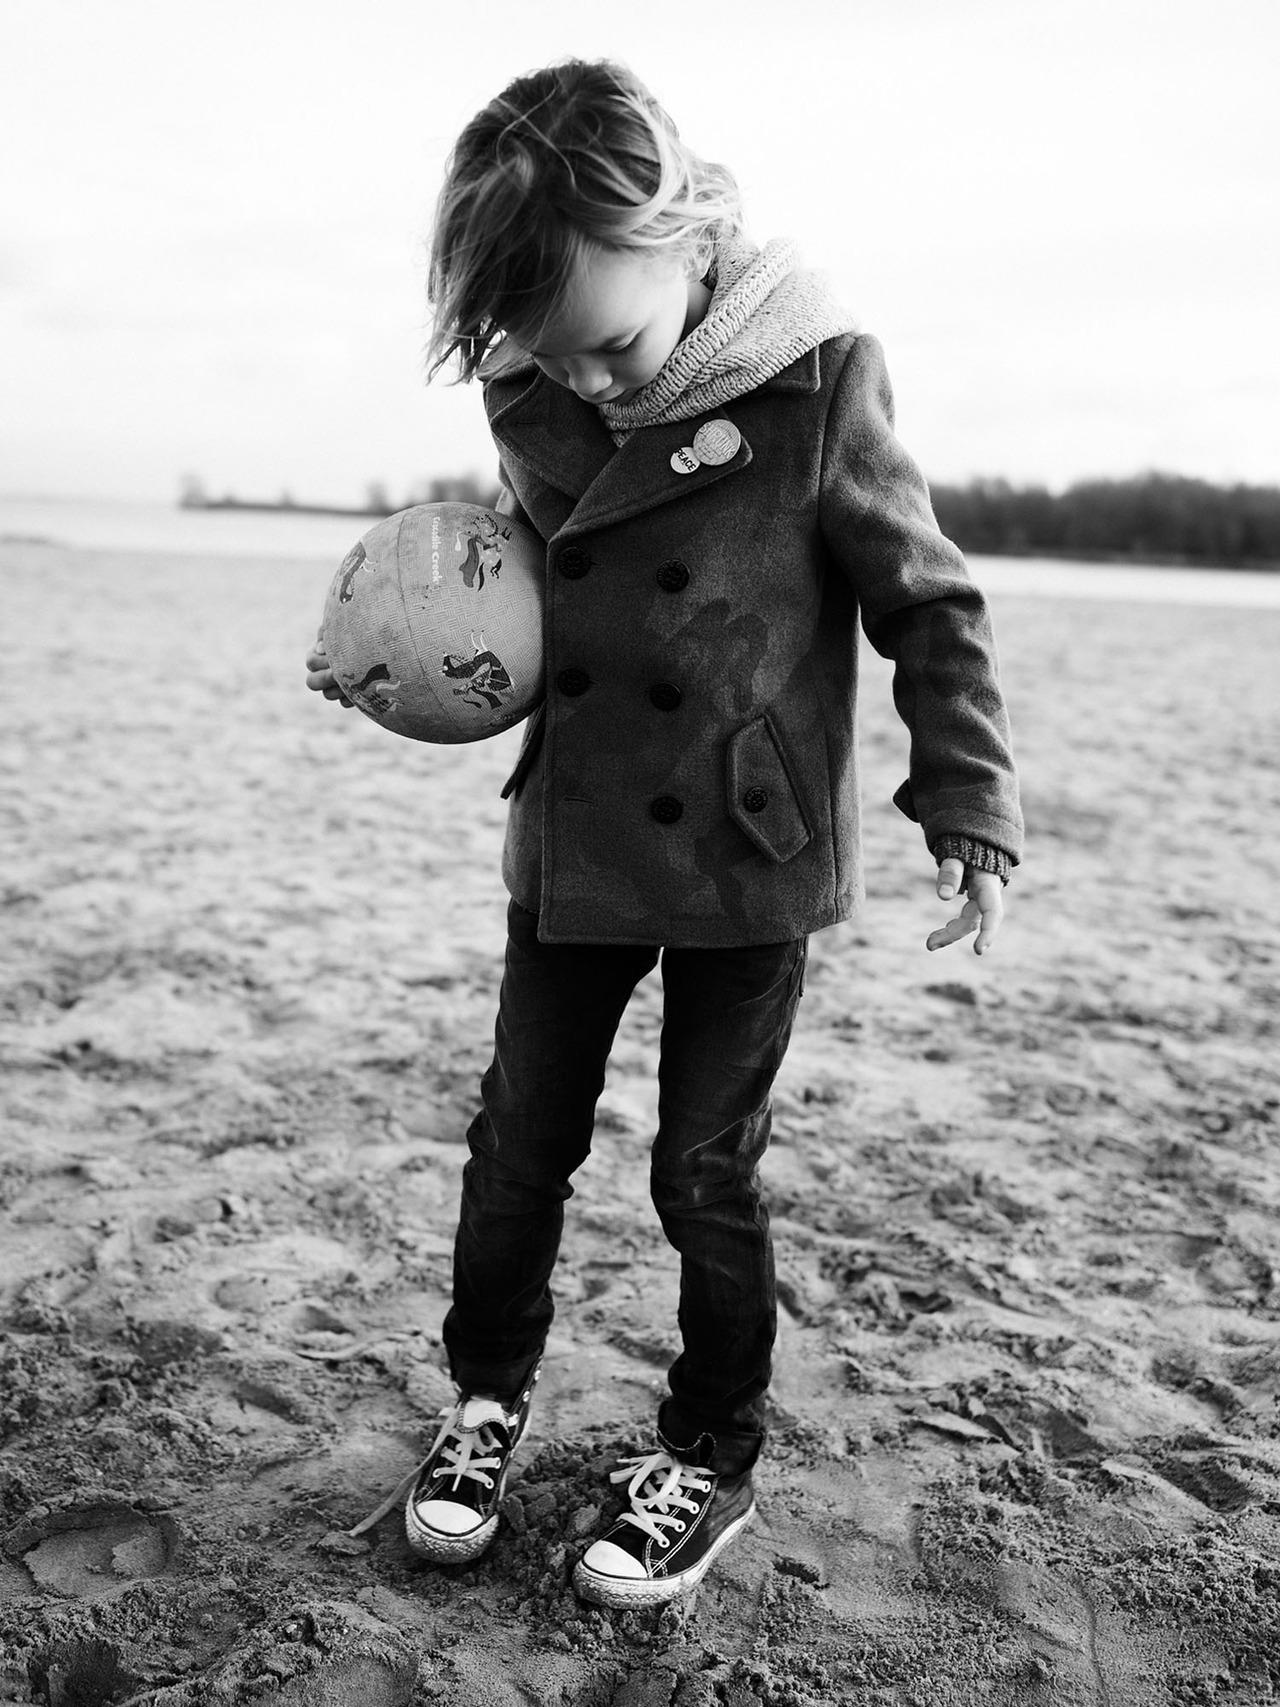 fortheloveofmegan:</p><br /><br /><br /><br /><br /> <p>My future child!<br /><br /><br /><br /><br /><br />